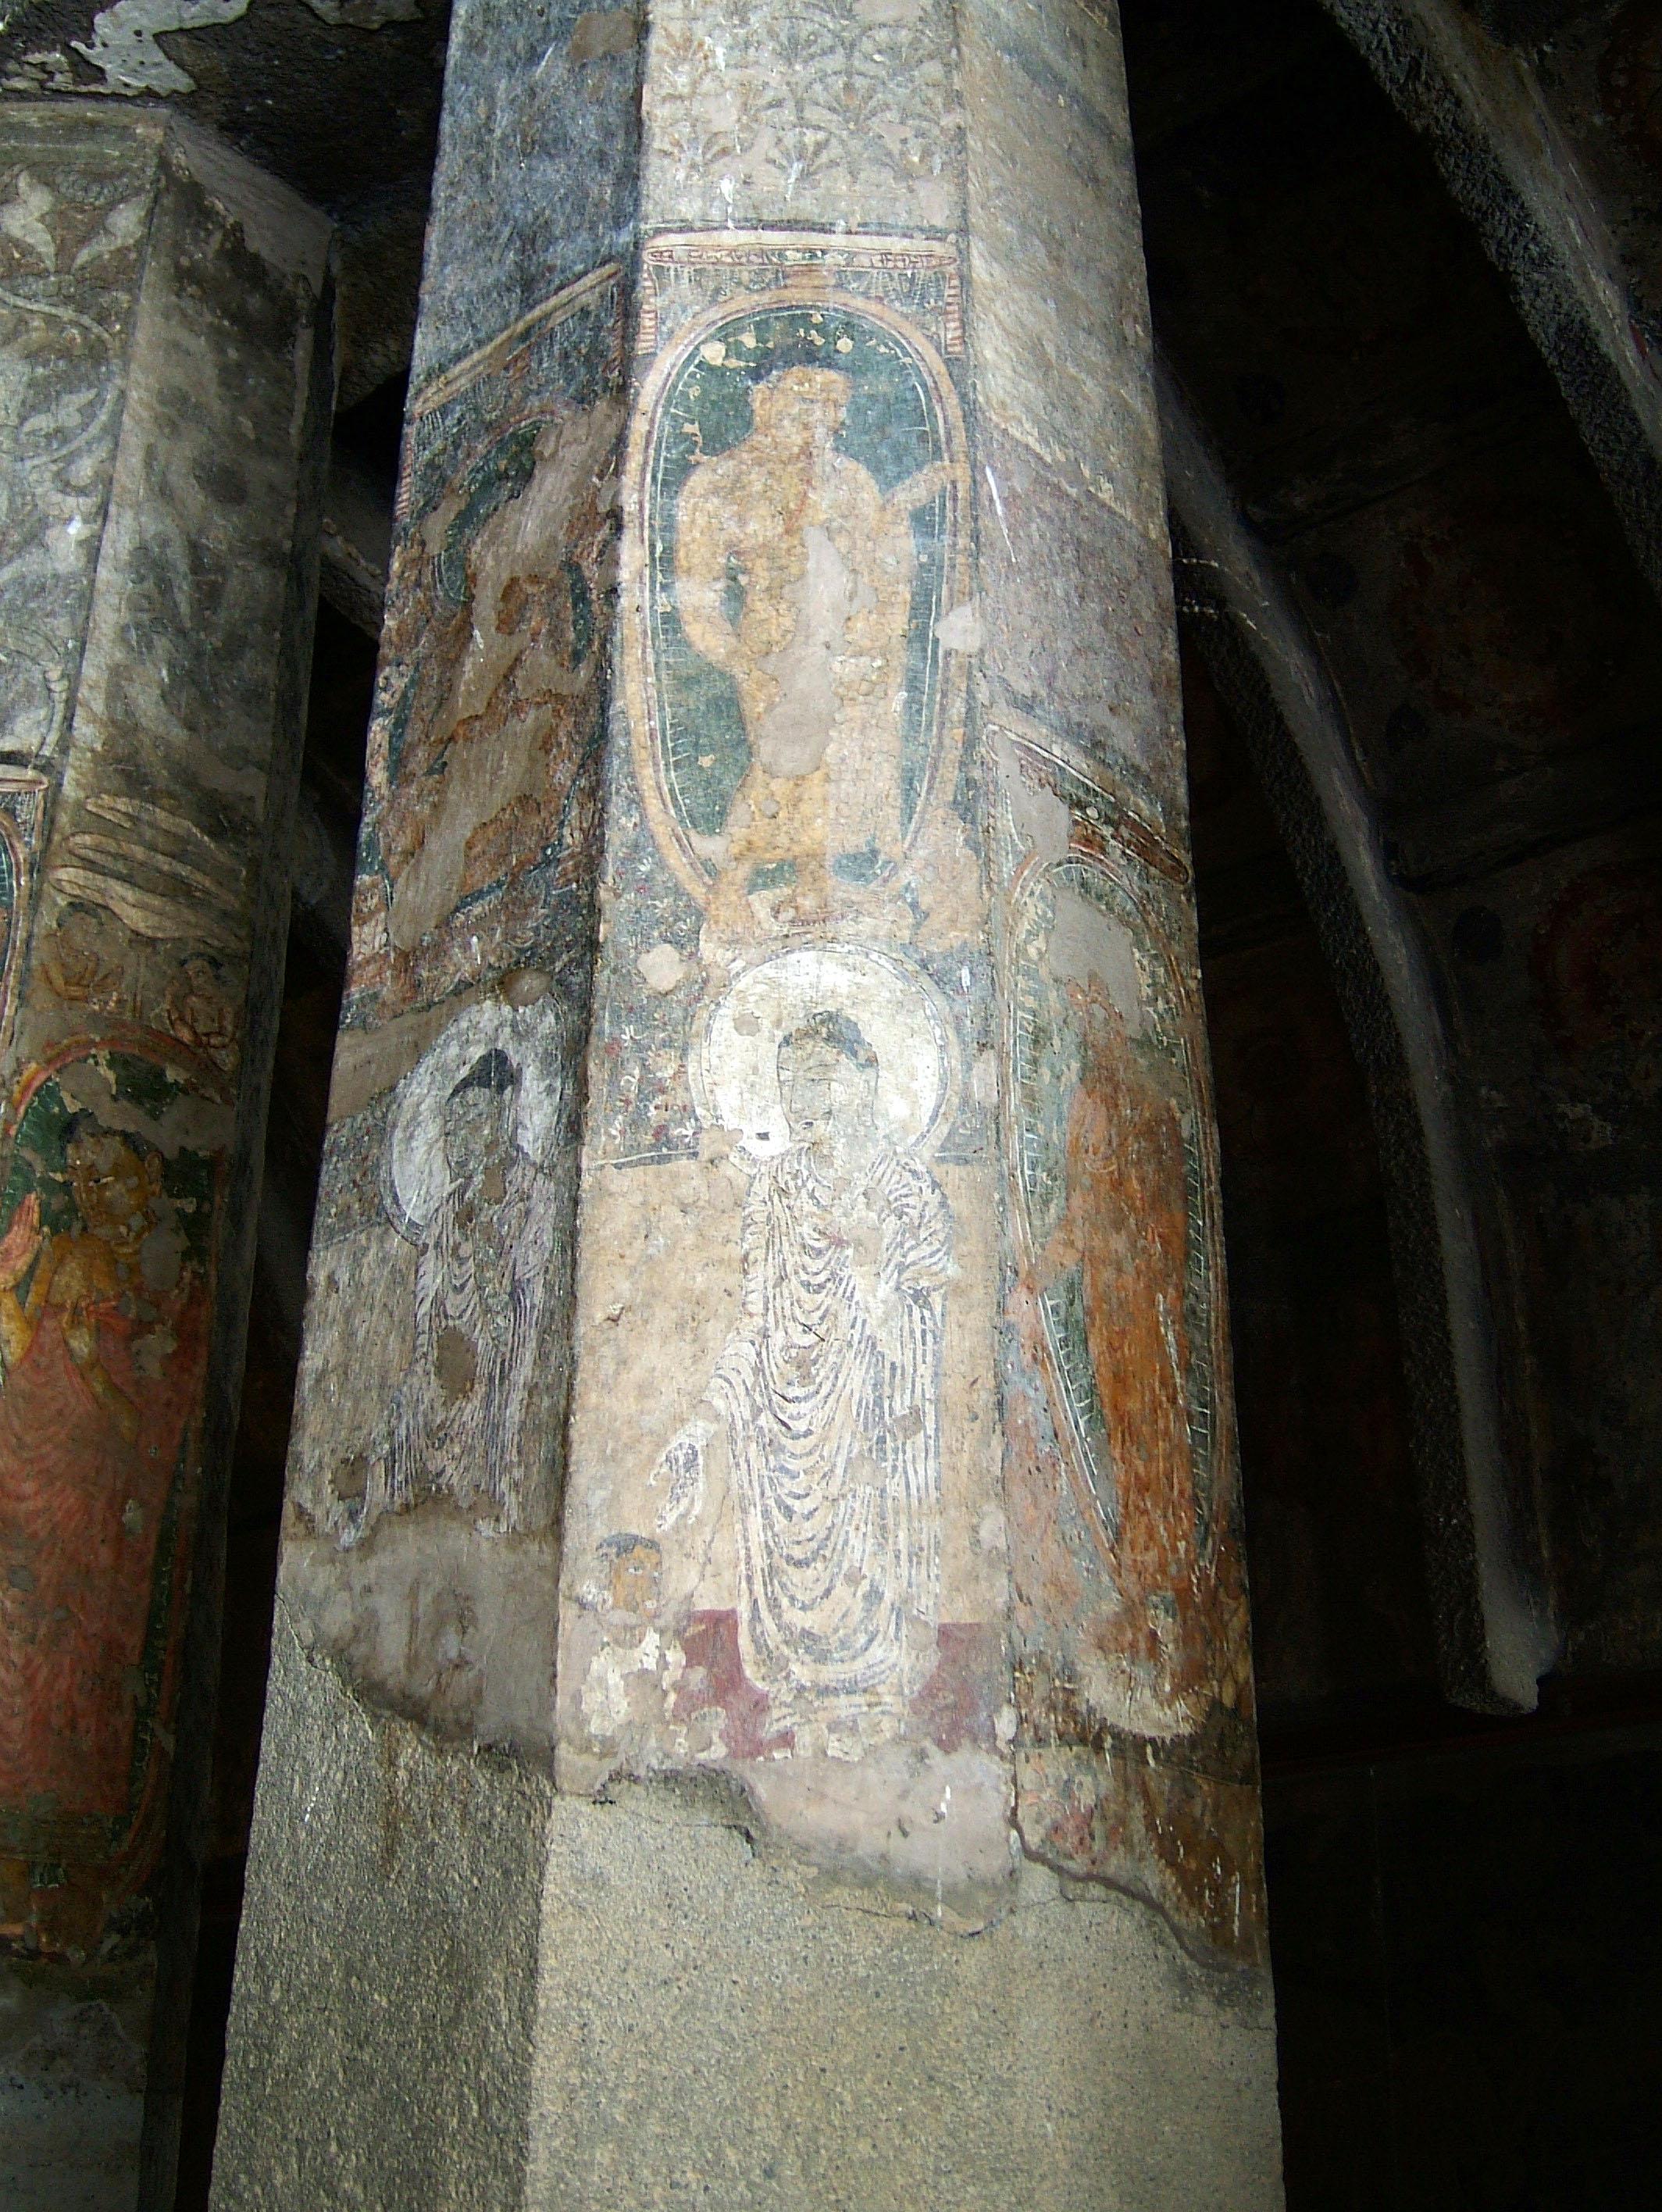 Marathwada Ajanta Caves paintings India Apr 2004 04